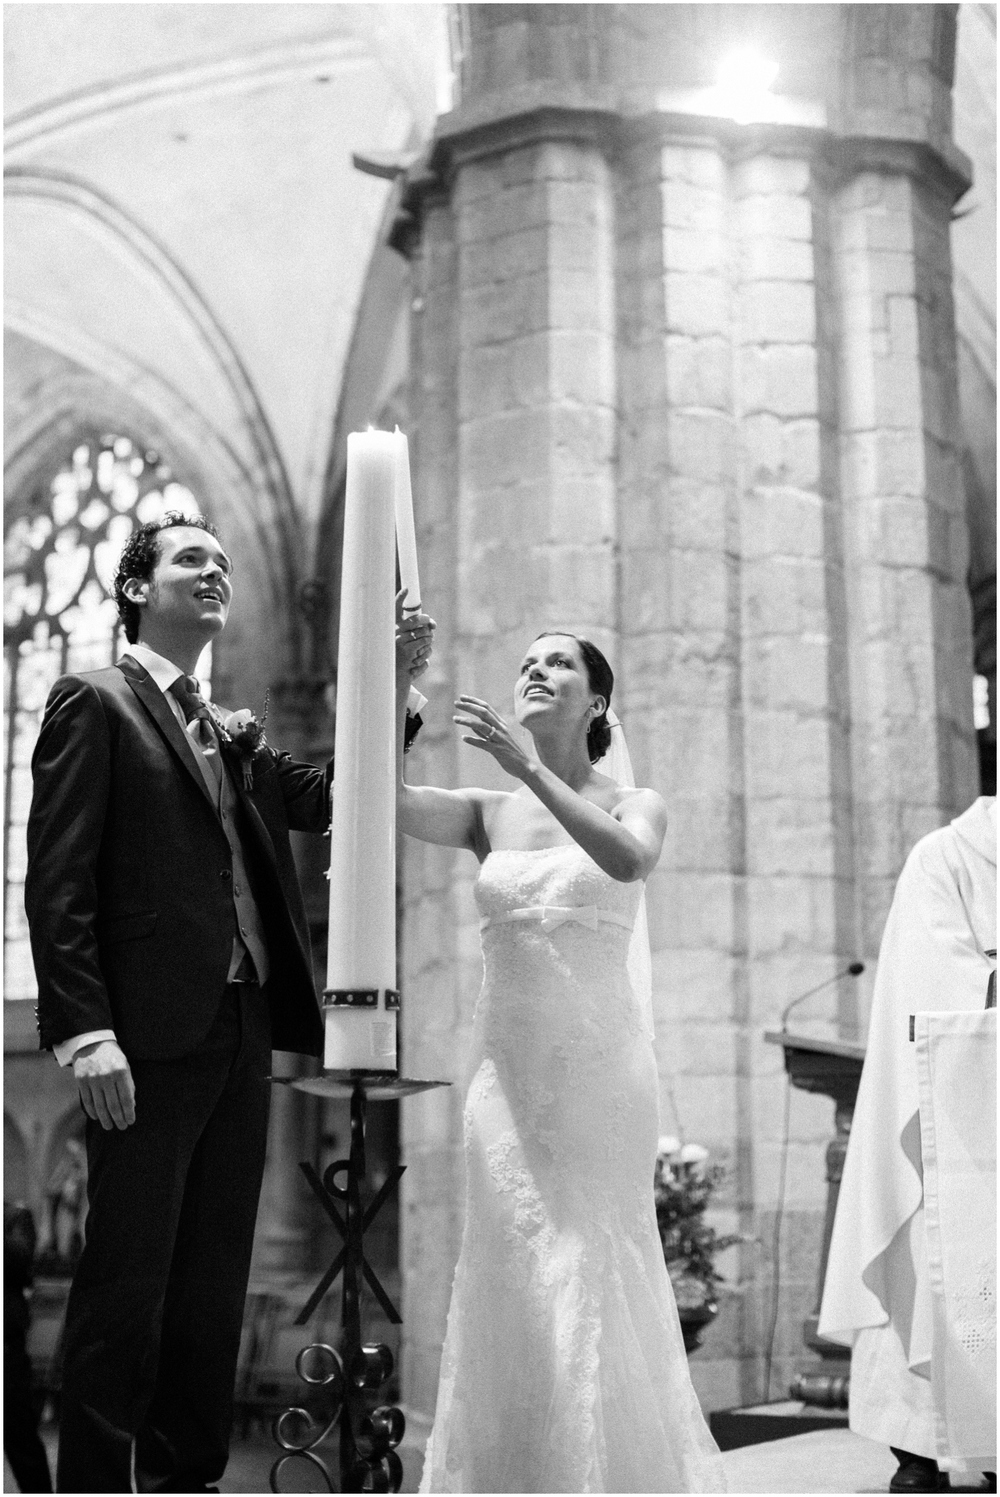 huwelijksfotograaf-hulst-nederland-007.jpg